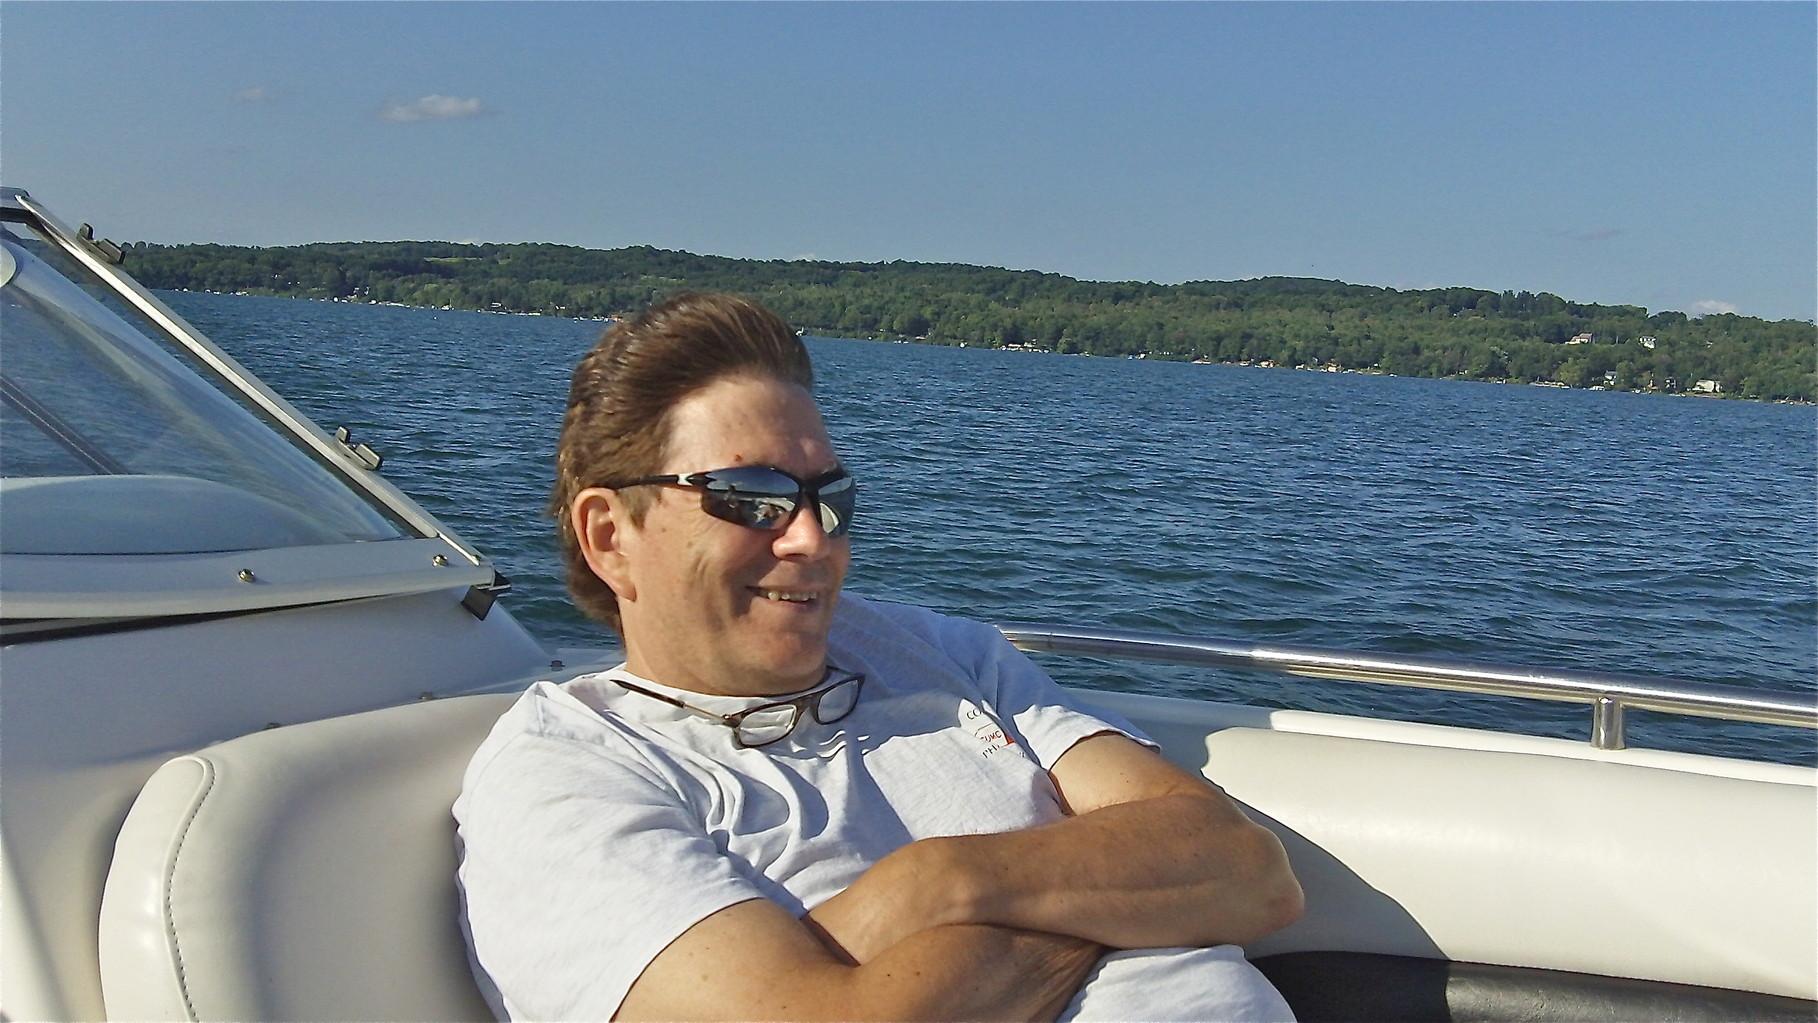 John enjoys the speed on the boat...